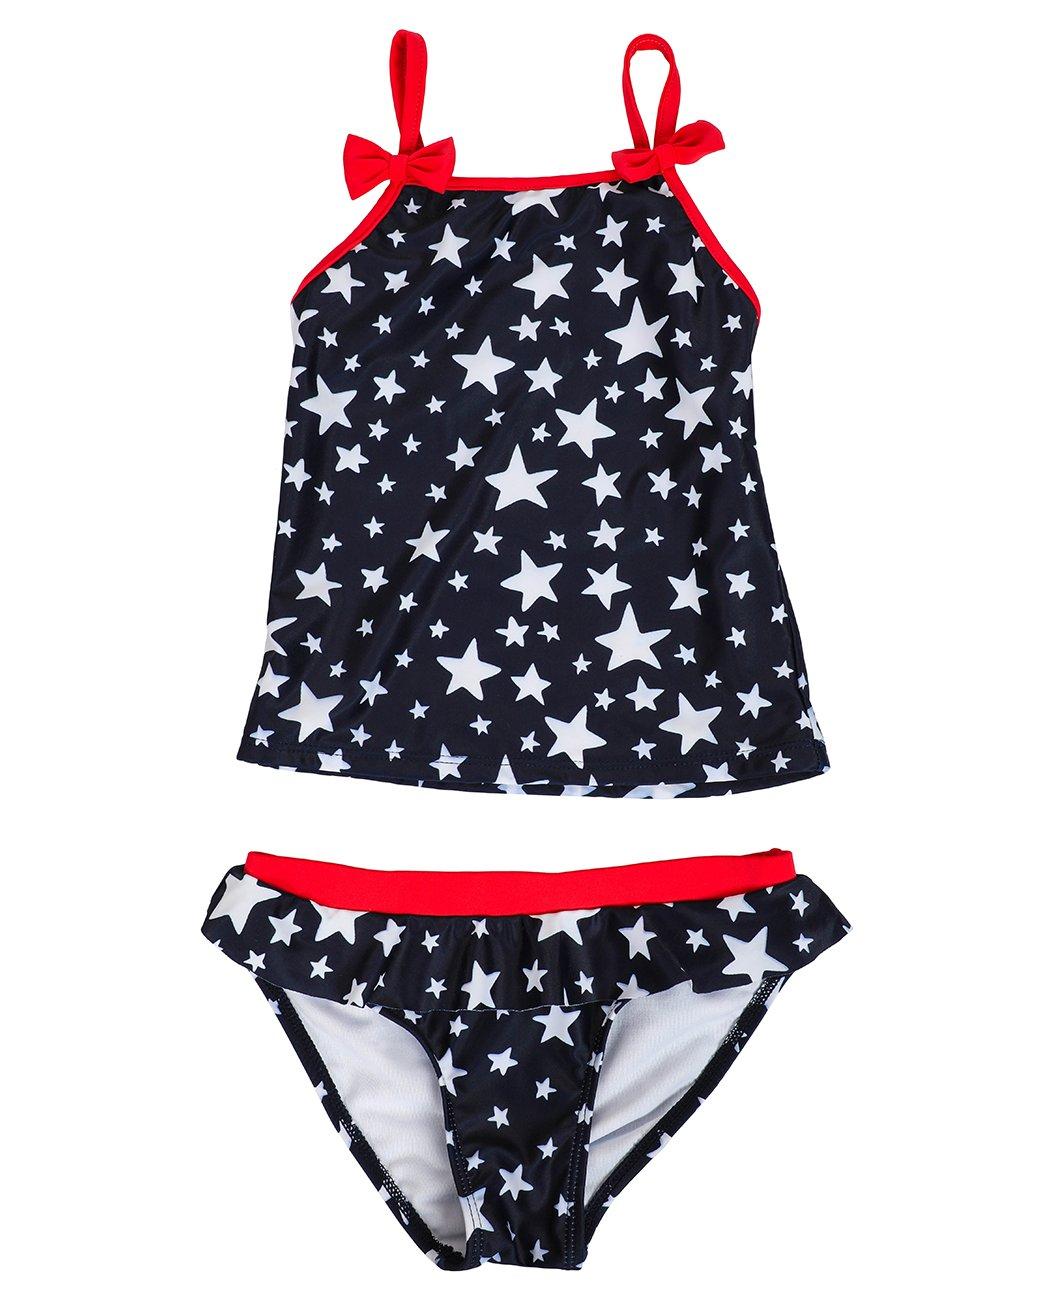 iDrawl Girls Tankini Beach Sport Swimsuit Two Piece Stars Swimwear by iDrawl (Image #3)